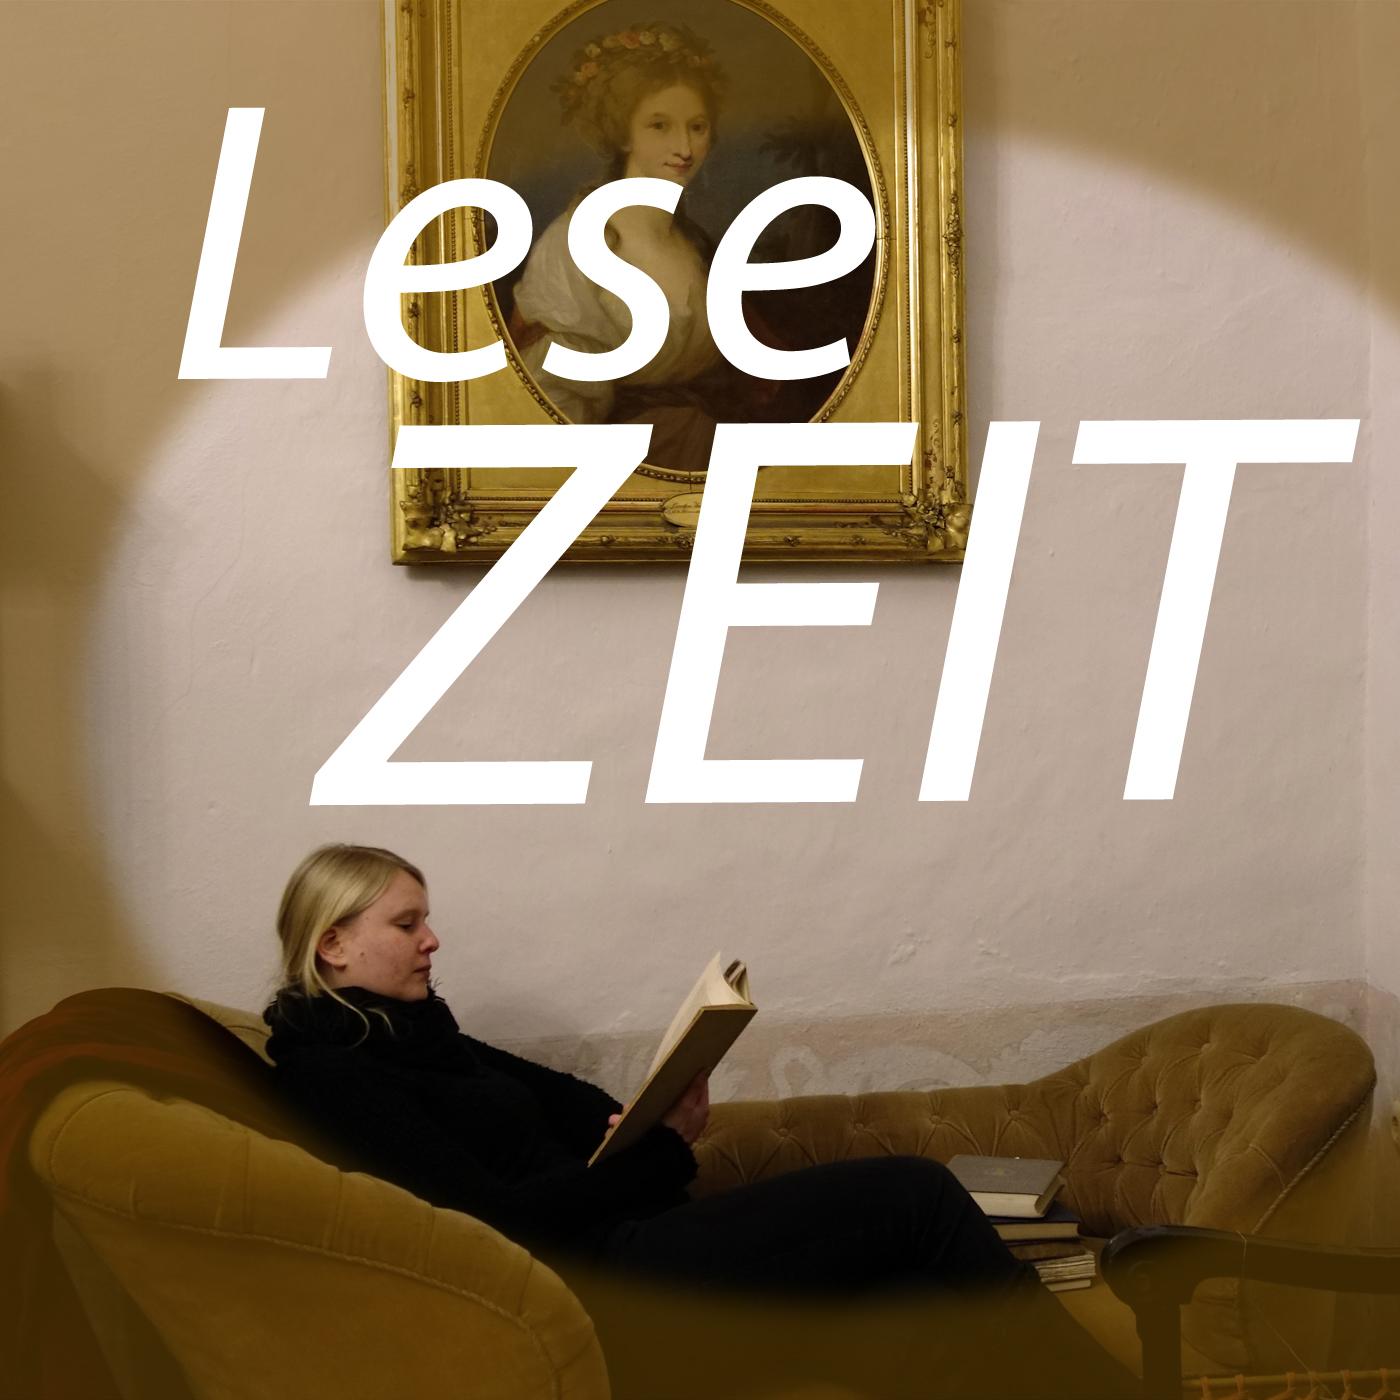 LeseZEIT